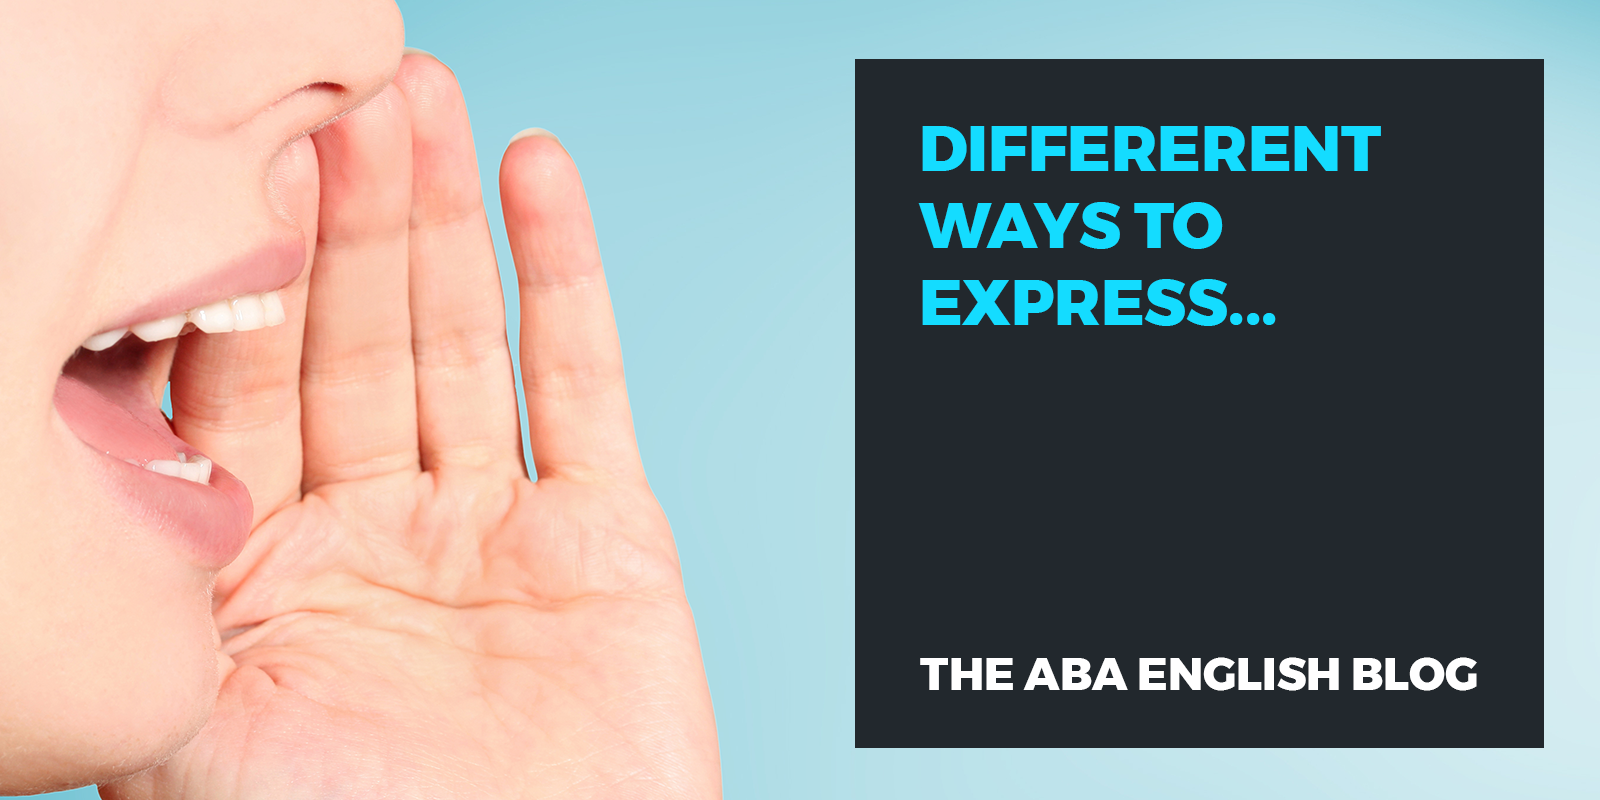 Differerent-ways-to-express-abaenglish